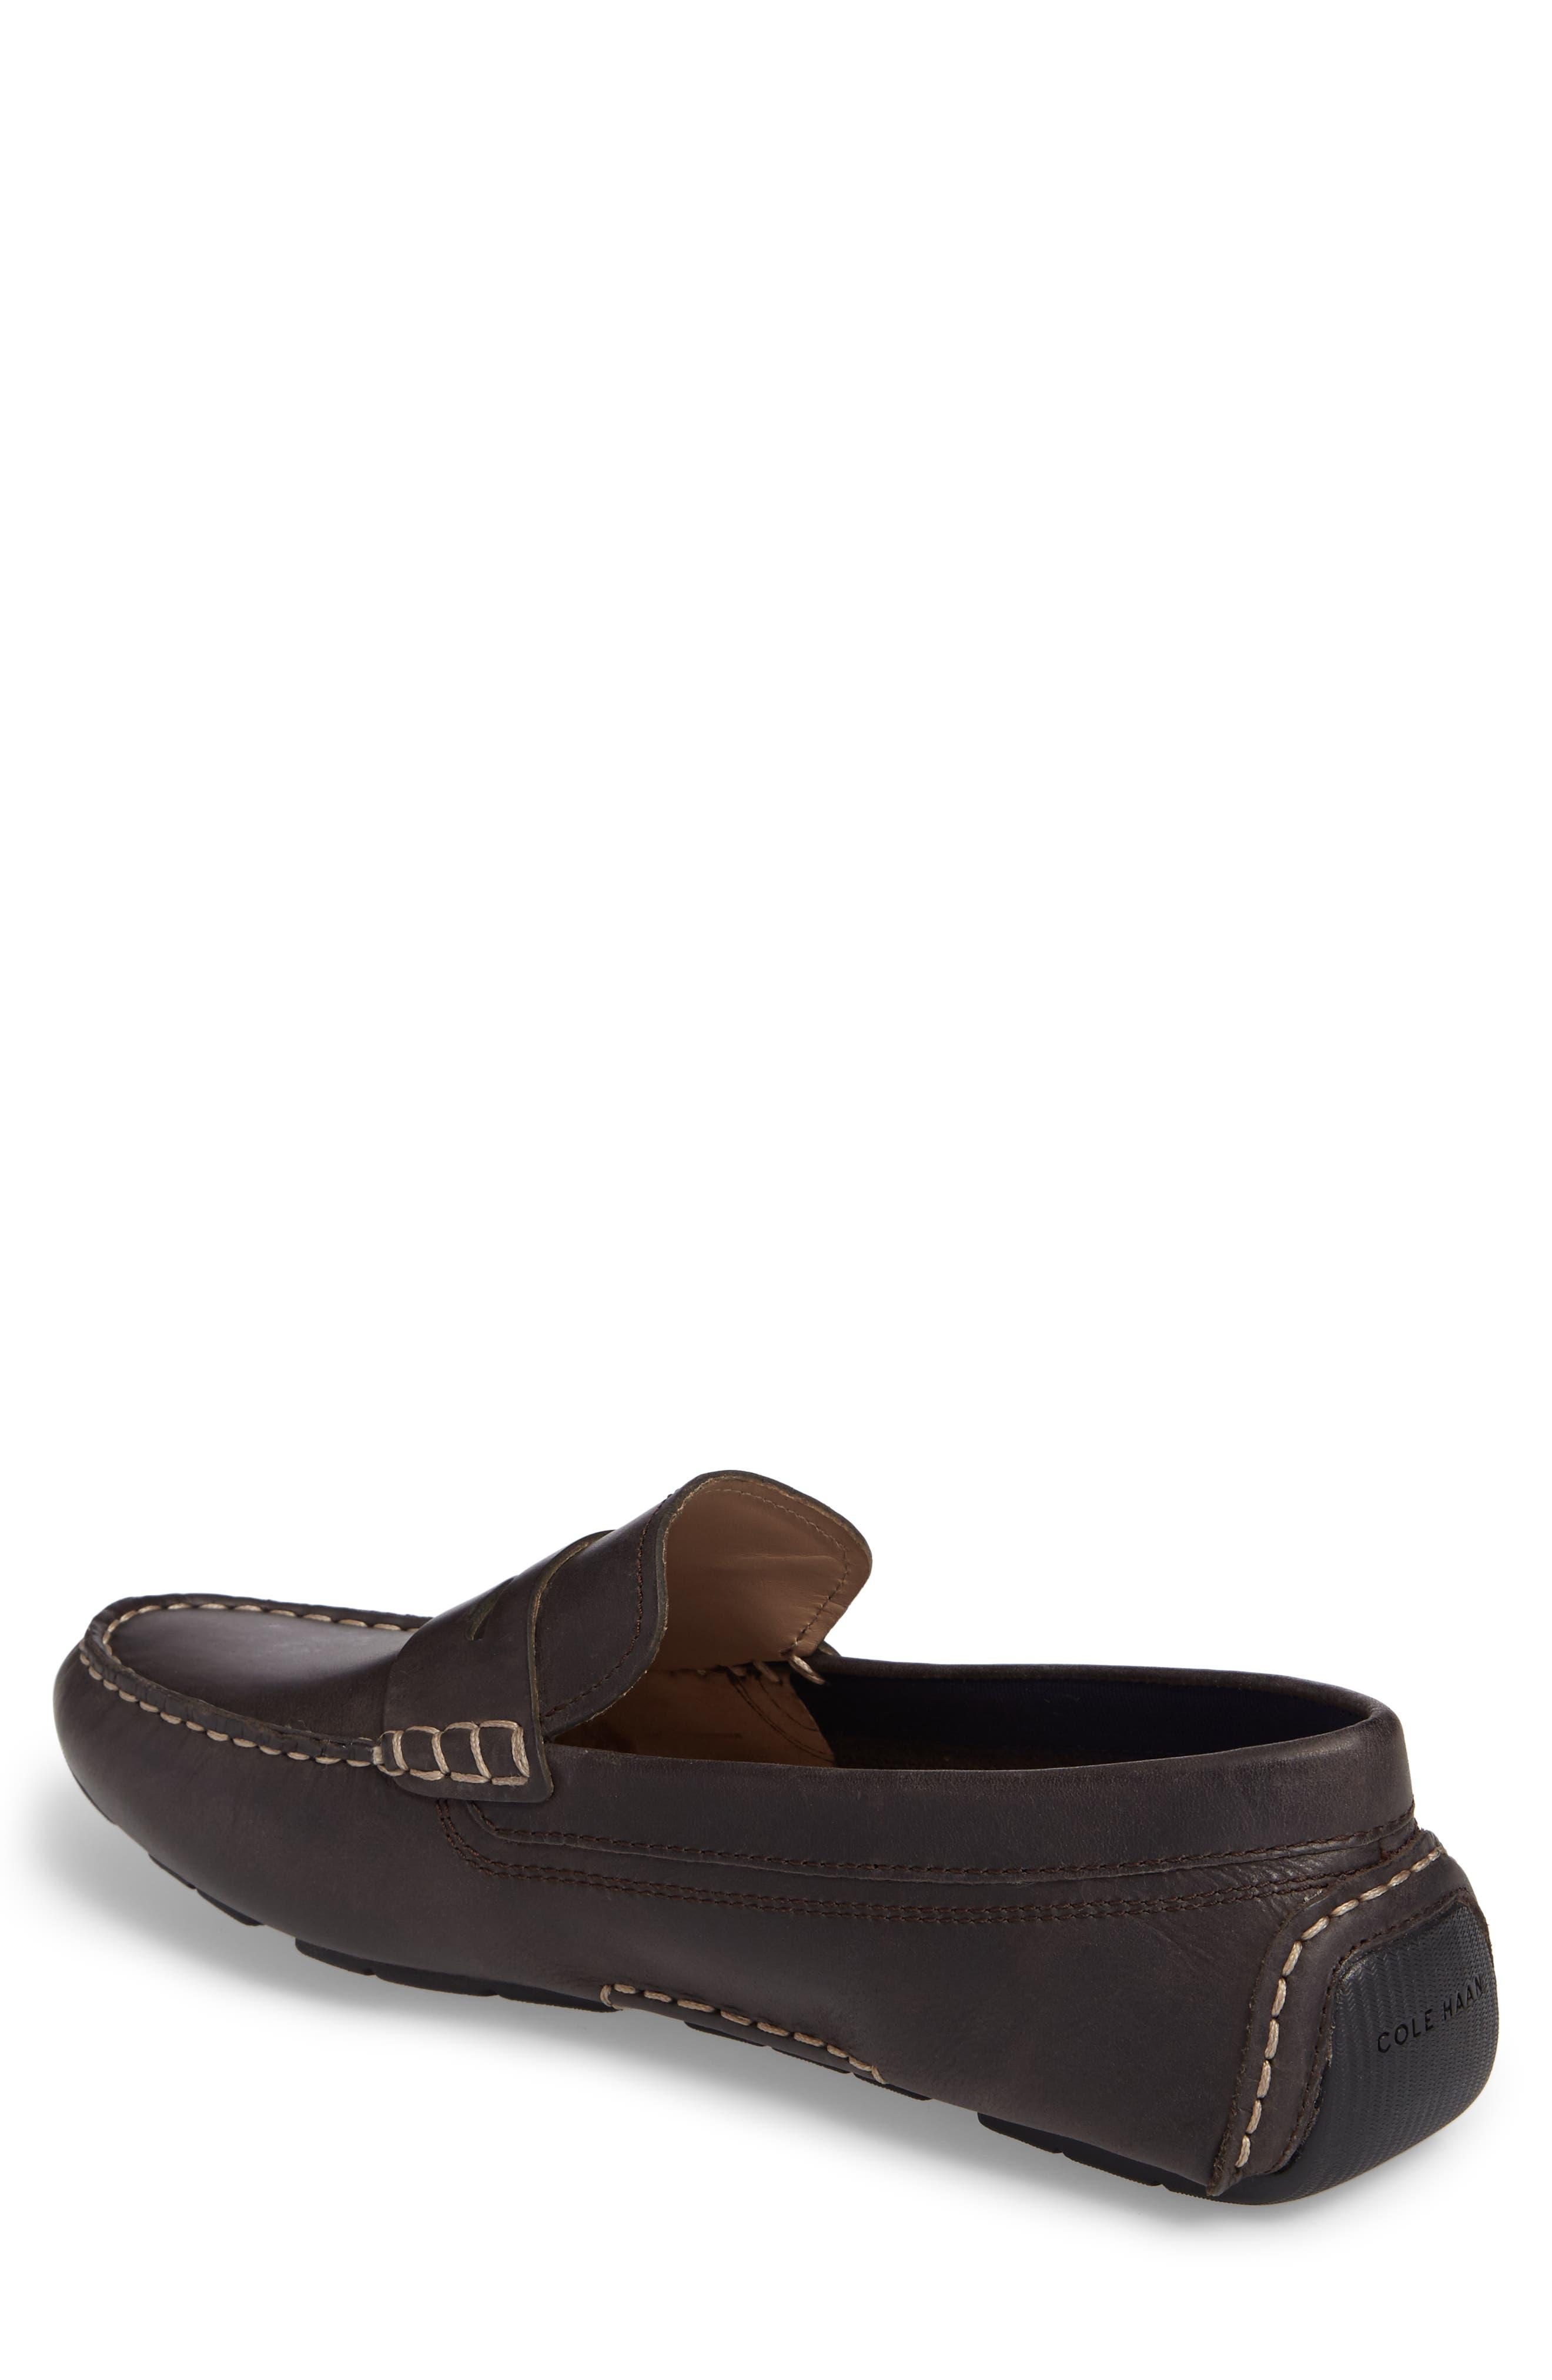 Alternate Image 2  - Cole Haan Kelson Driving Shoe (Men)